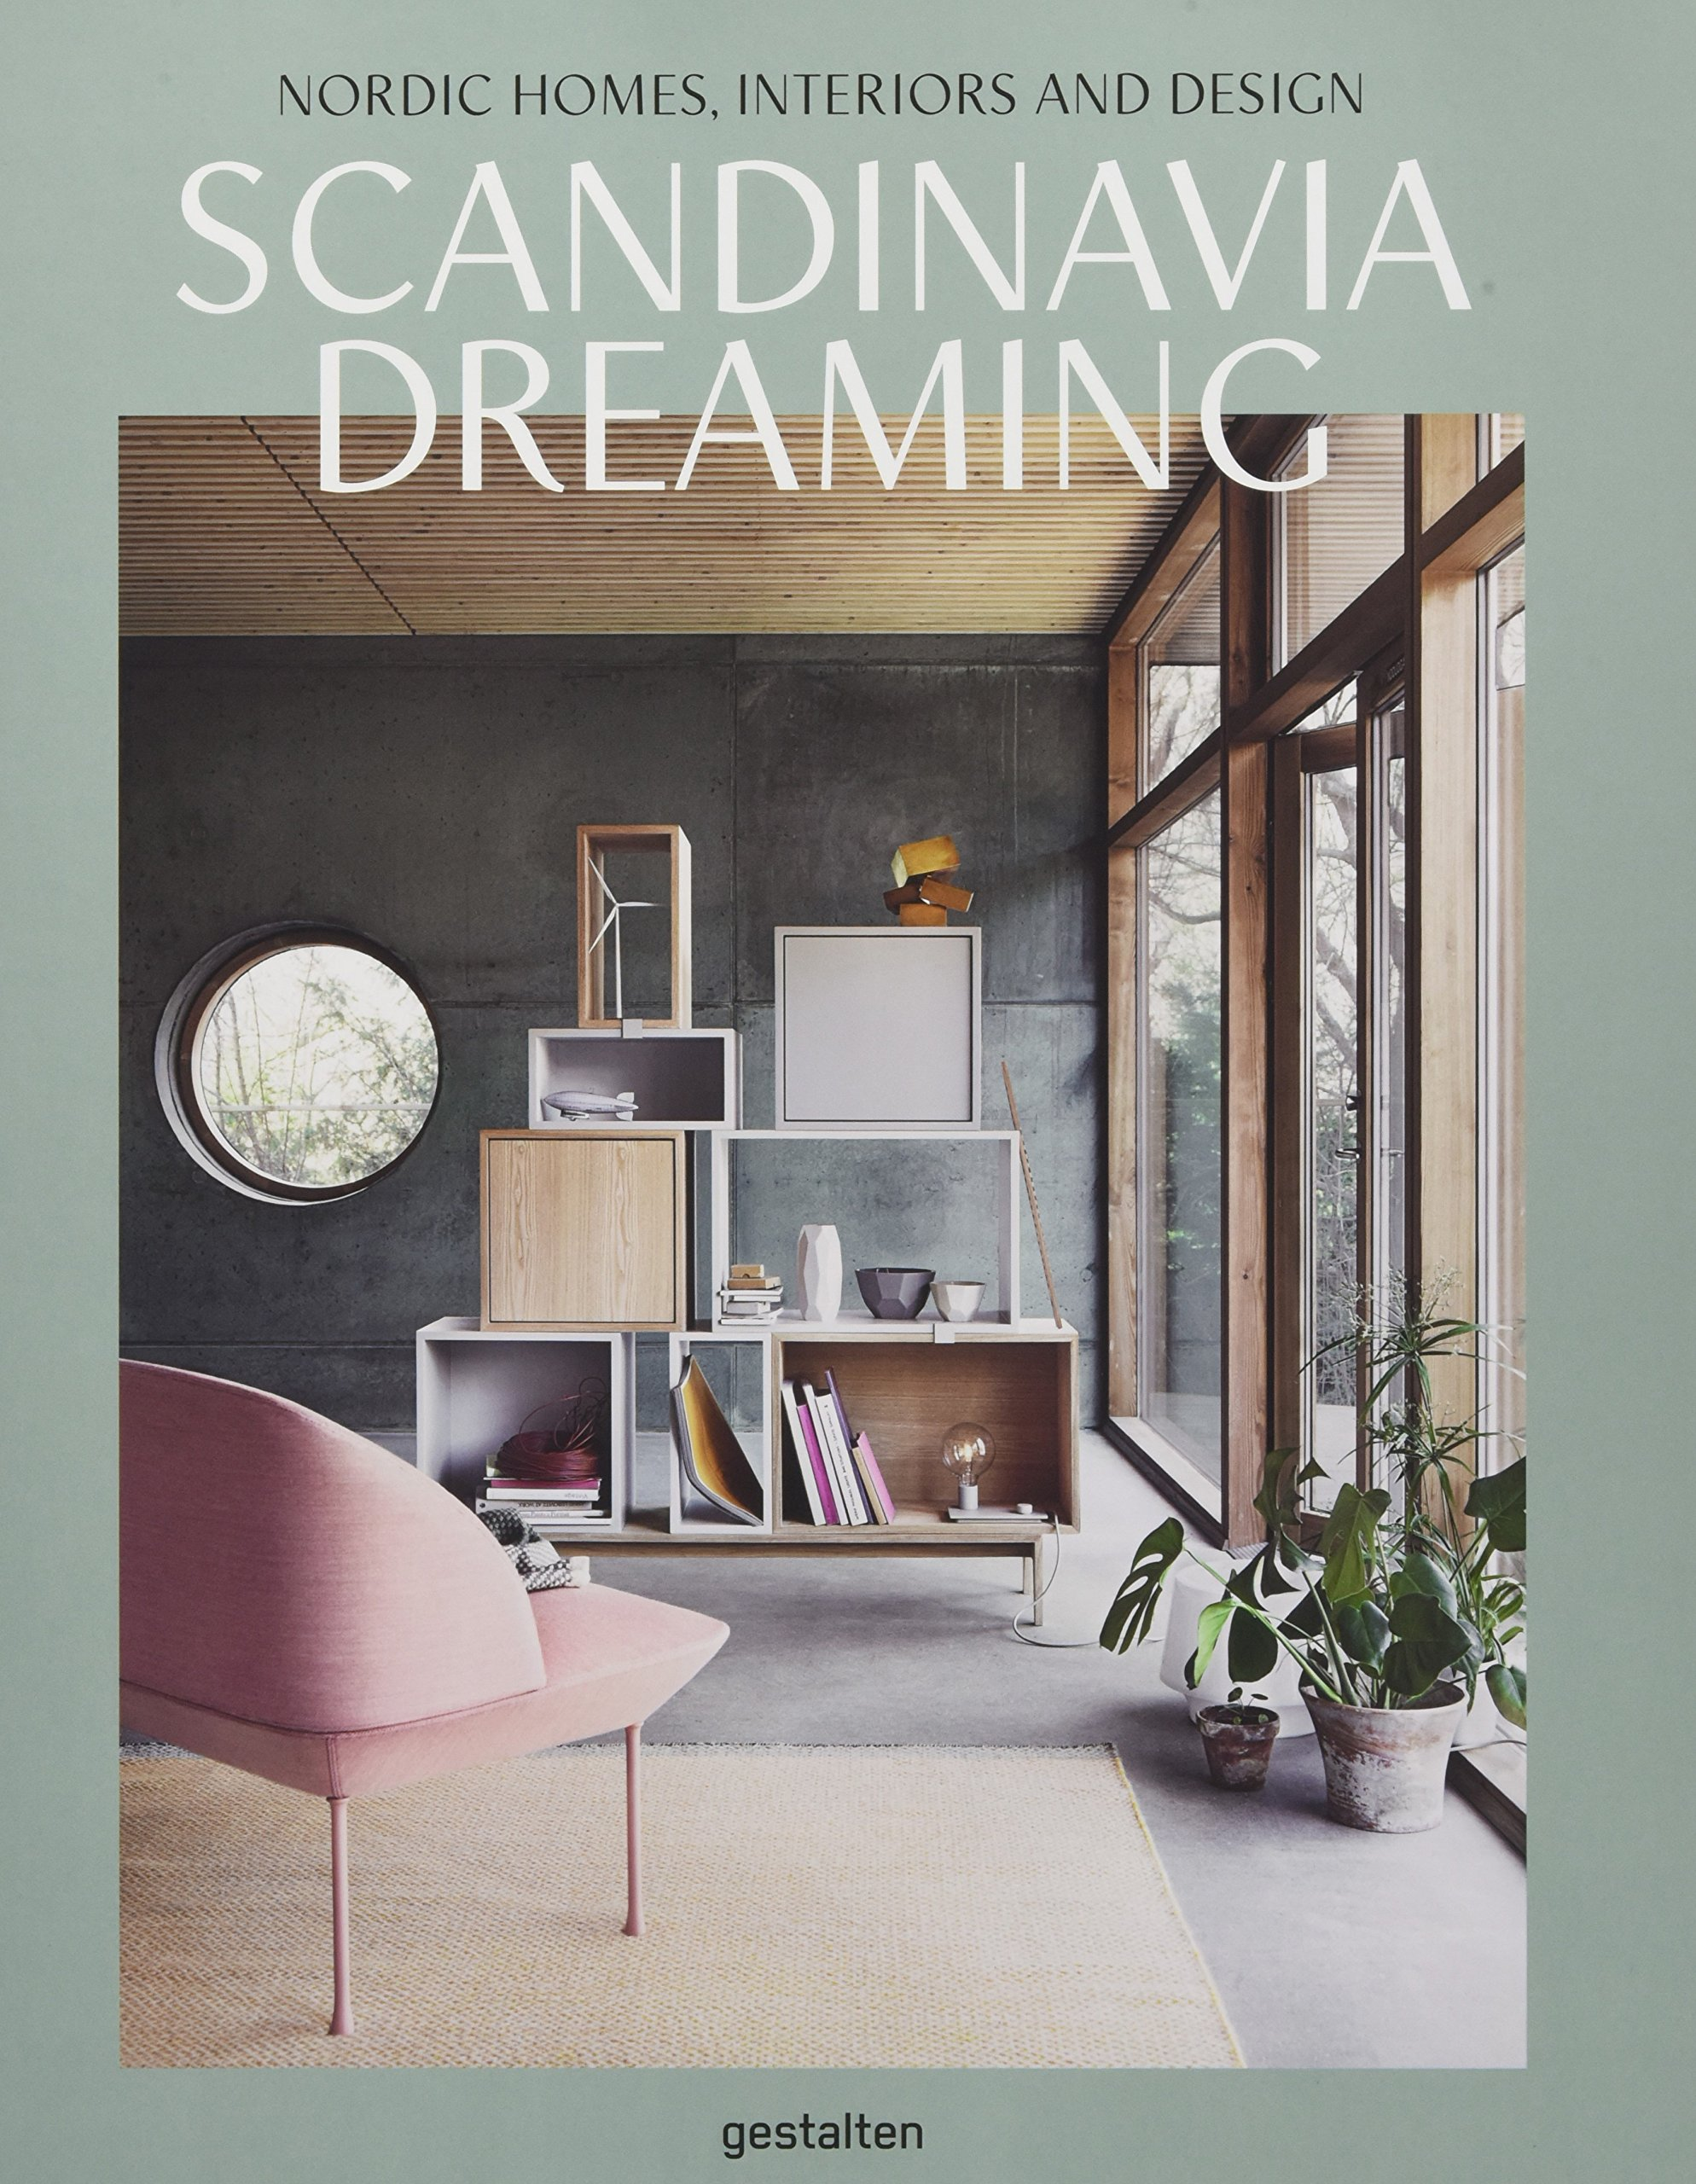 Amazon.com: Scandinavia Dreaming: Nordic Homes, Interiors and ...